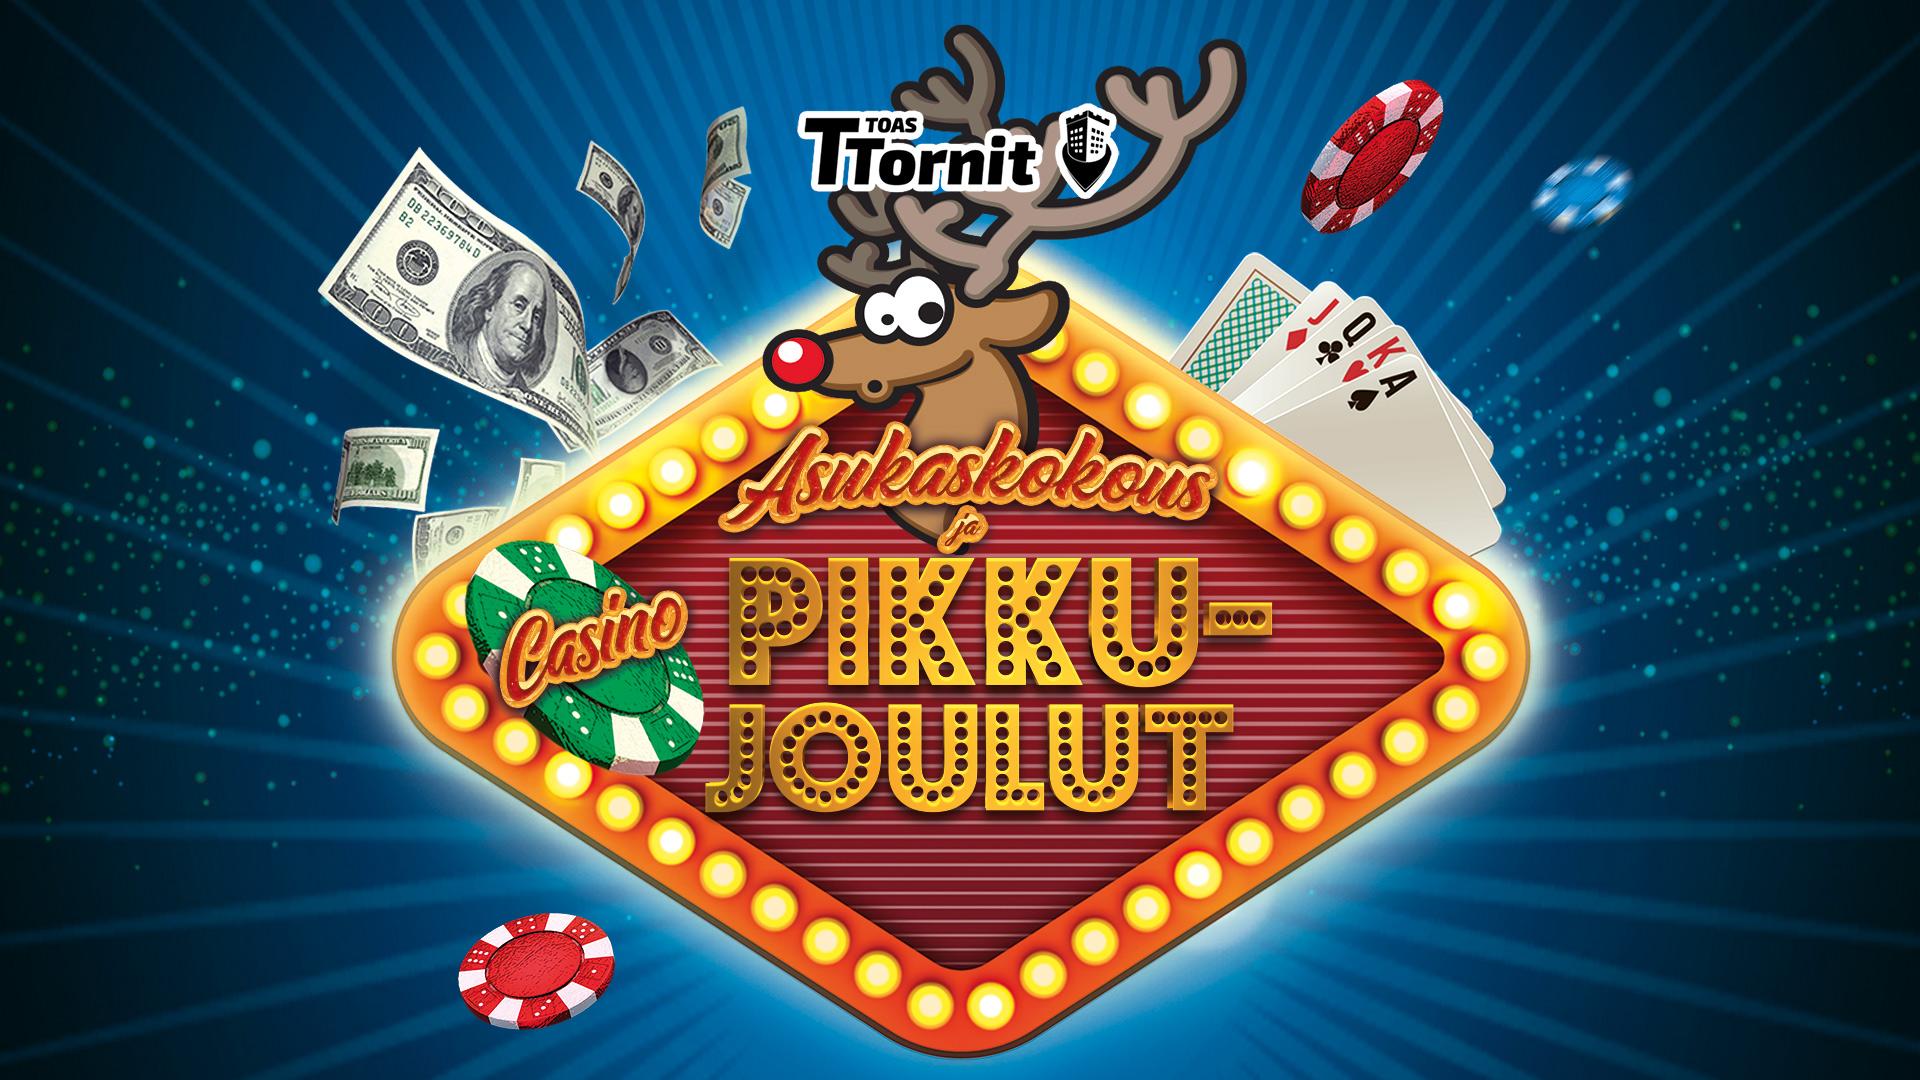 2019:tapahtumat:casinojoulut19-fabocover.jpg